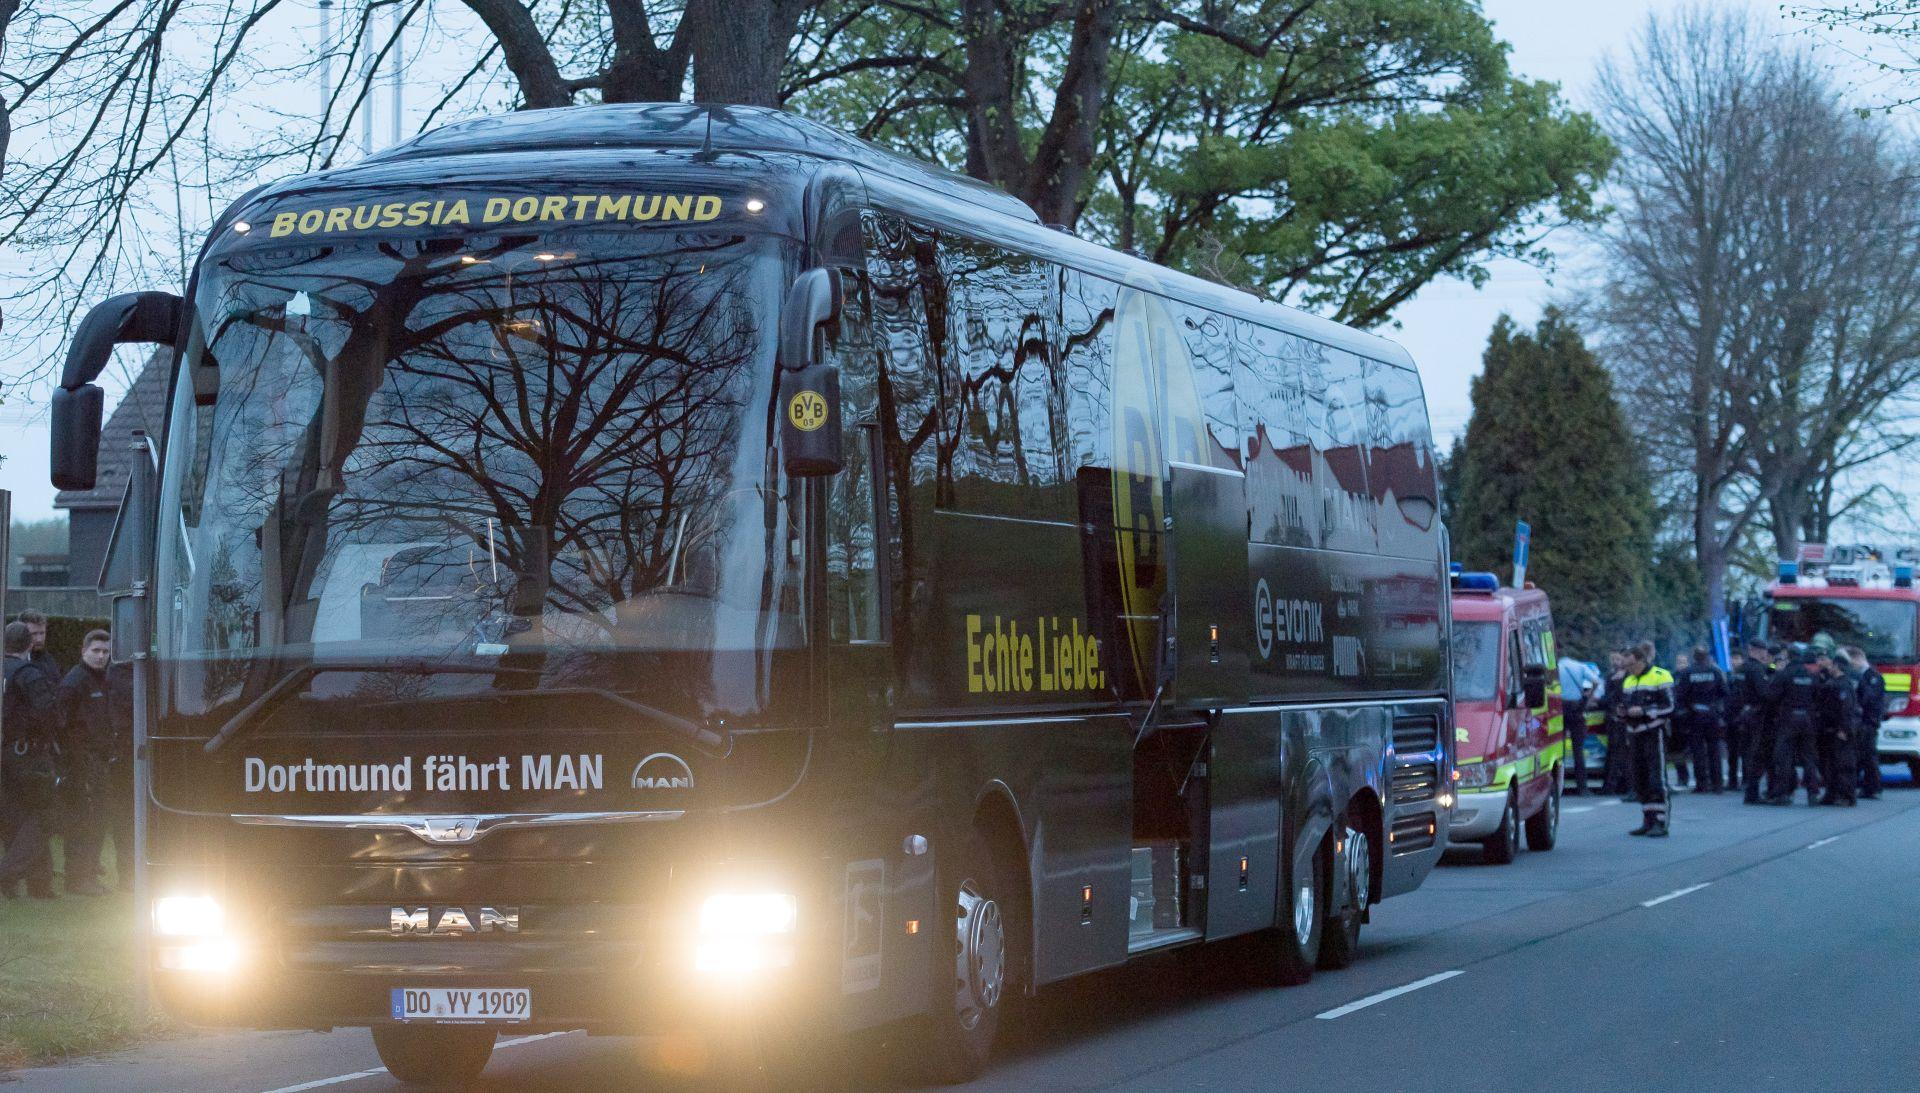 Uhićen osumnjičeni za napad na autobus Borussije